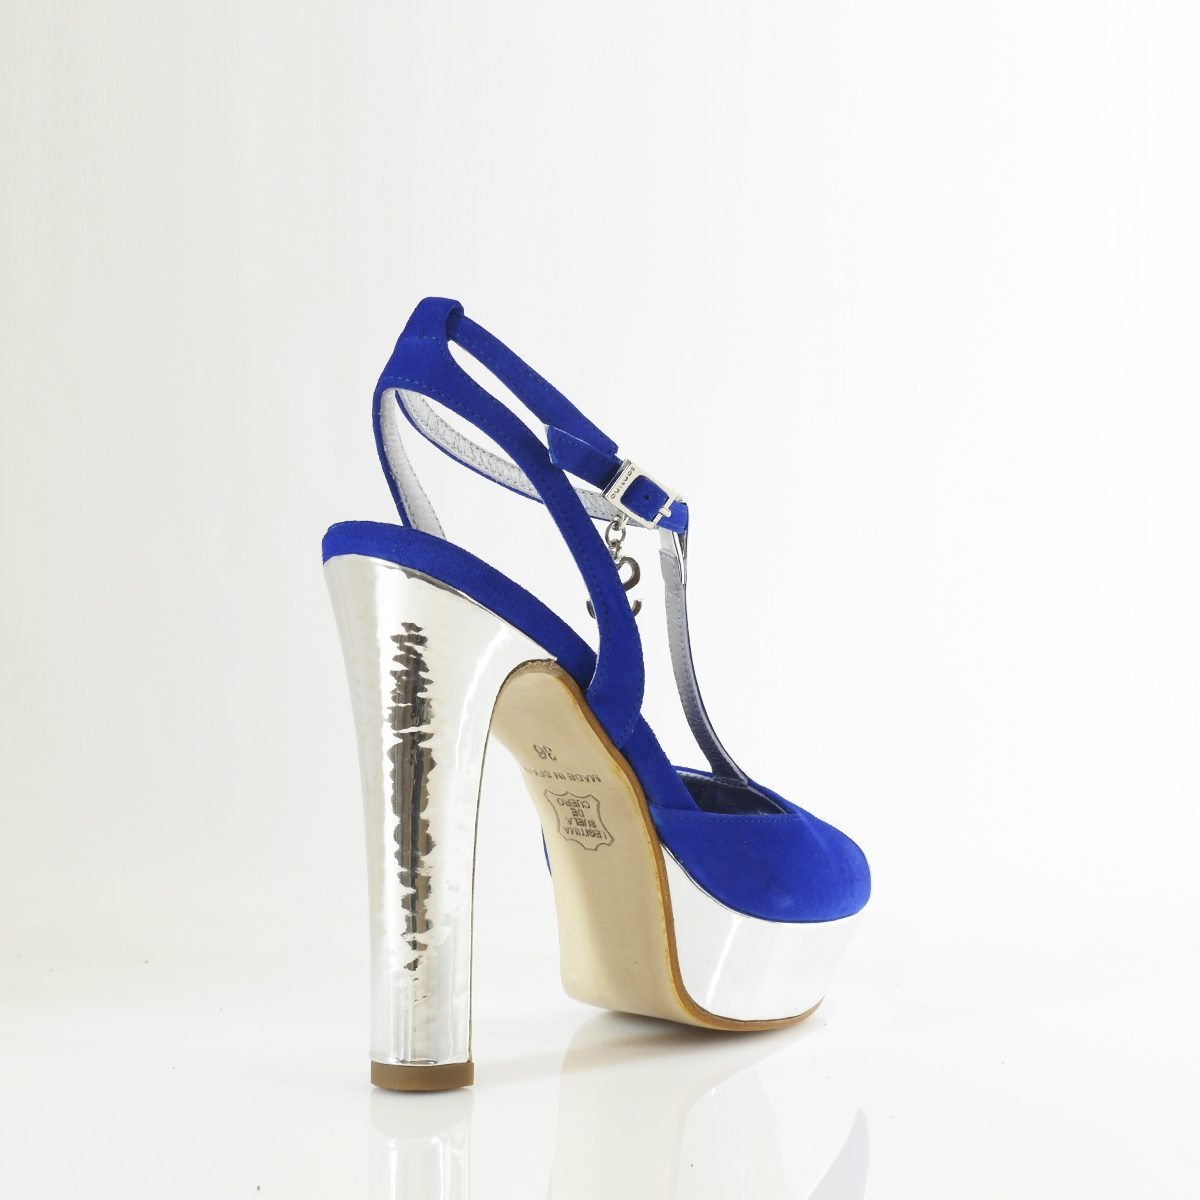 SANDALIA MOD.1637 (12,5cm) - Zapatos personalizados fiesta